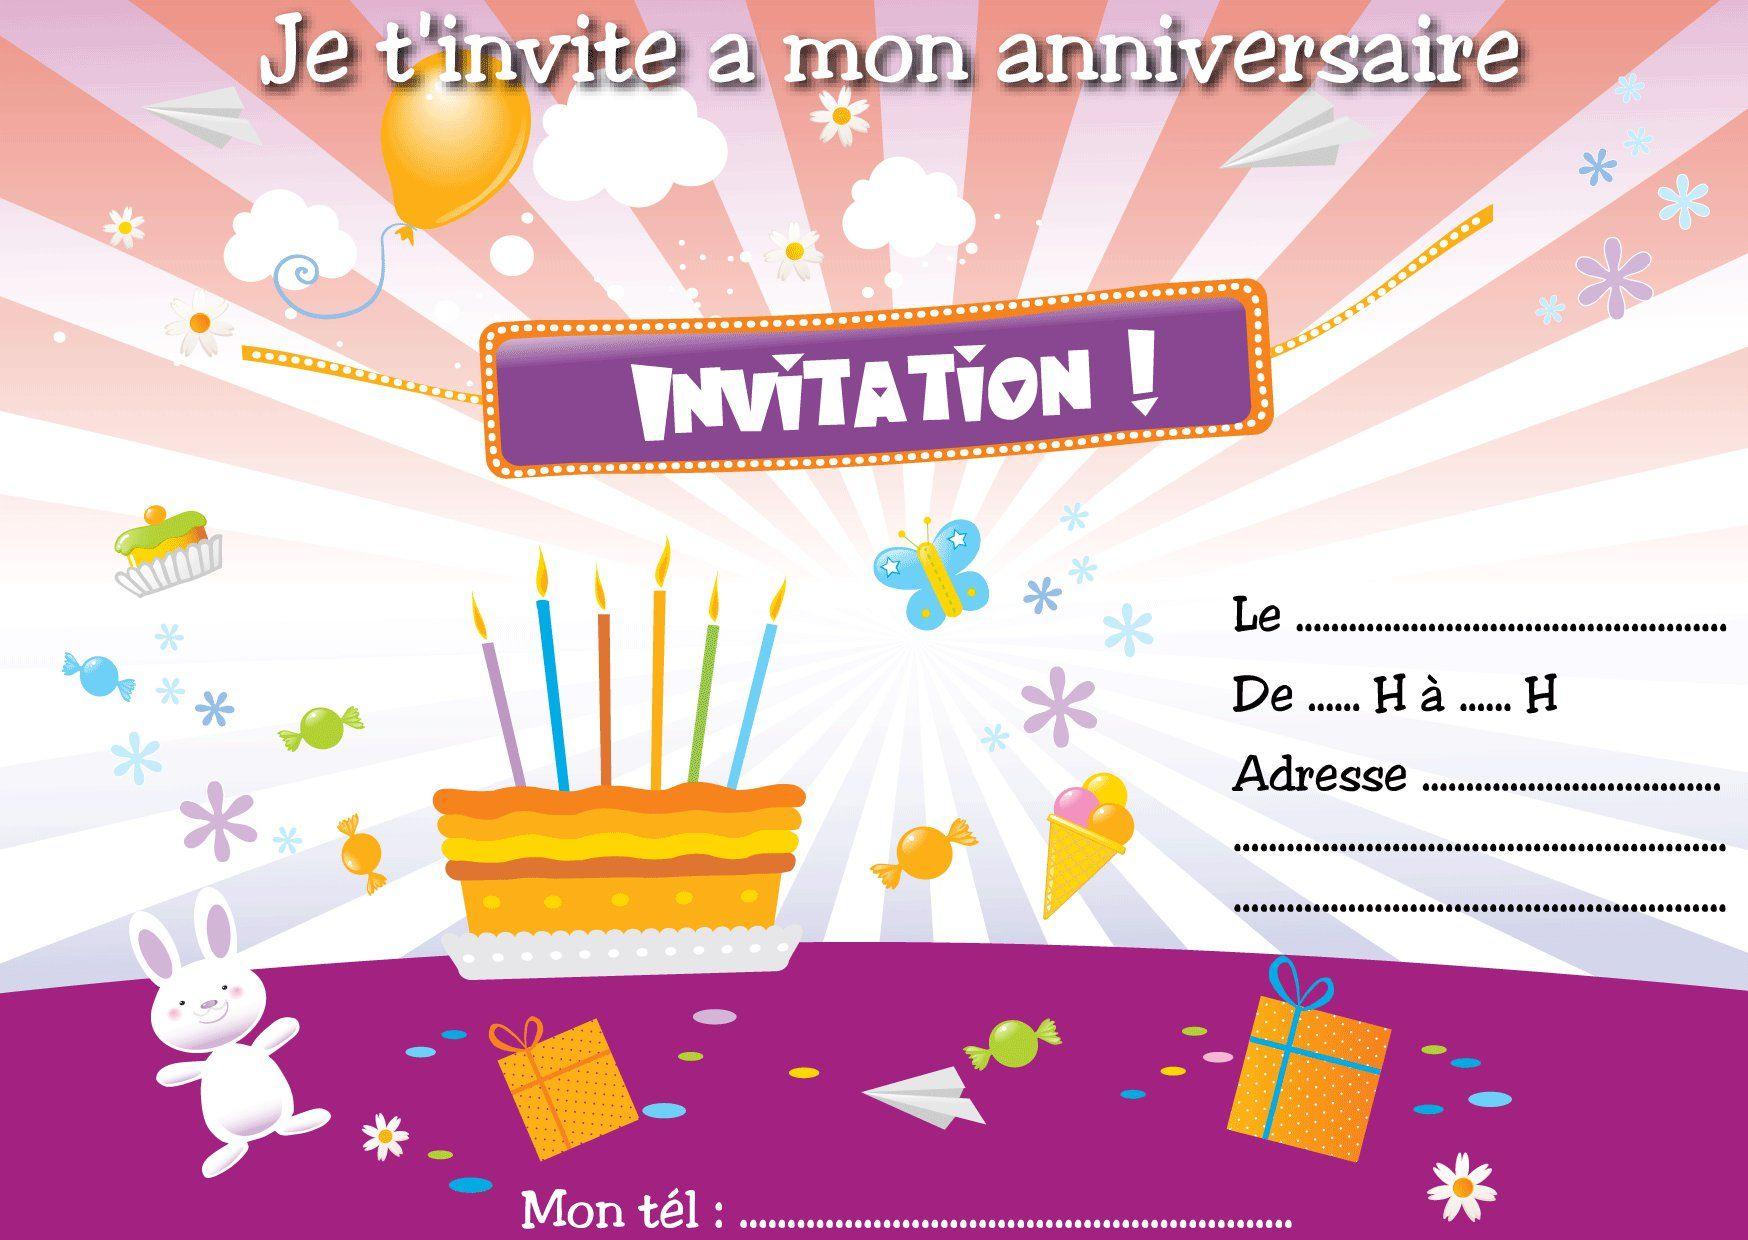 Modele Carte Anniversaire 60 Ans Gratuite intérieur carte invitation anniversaire imprimer : cartes invitation